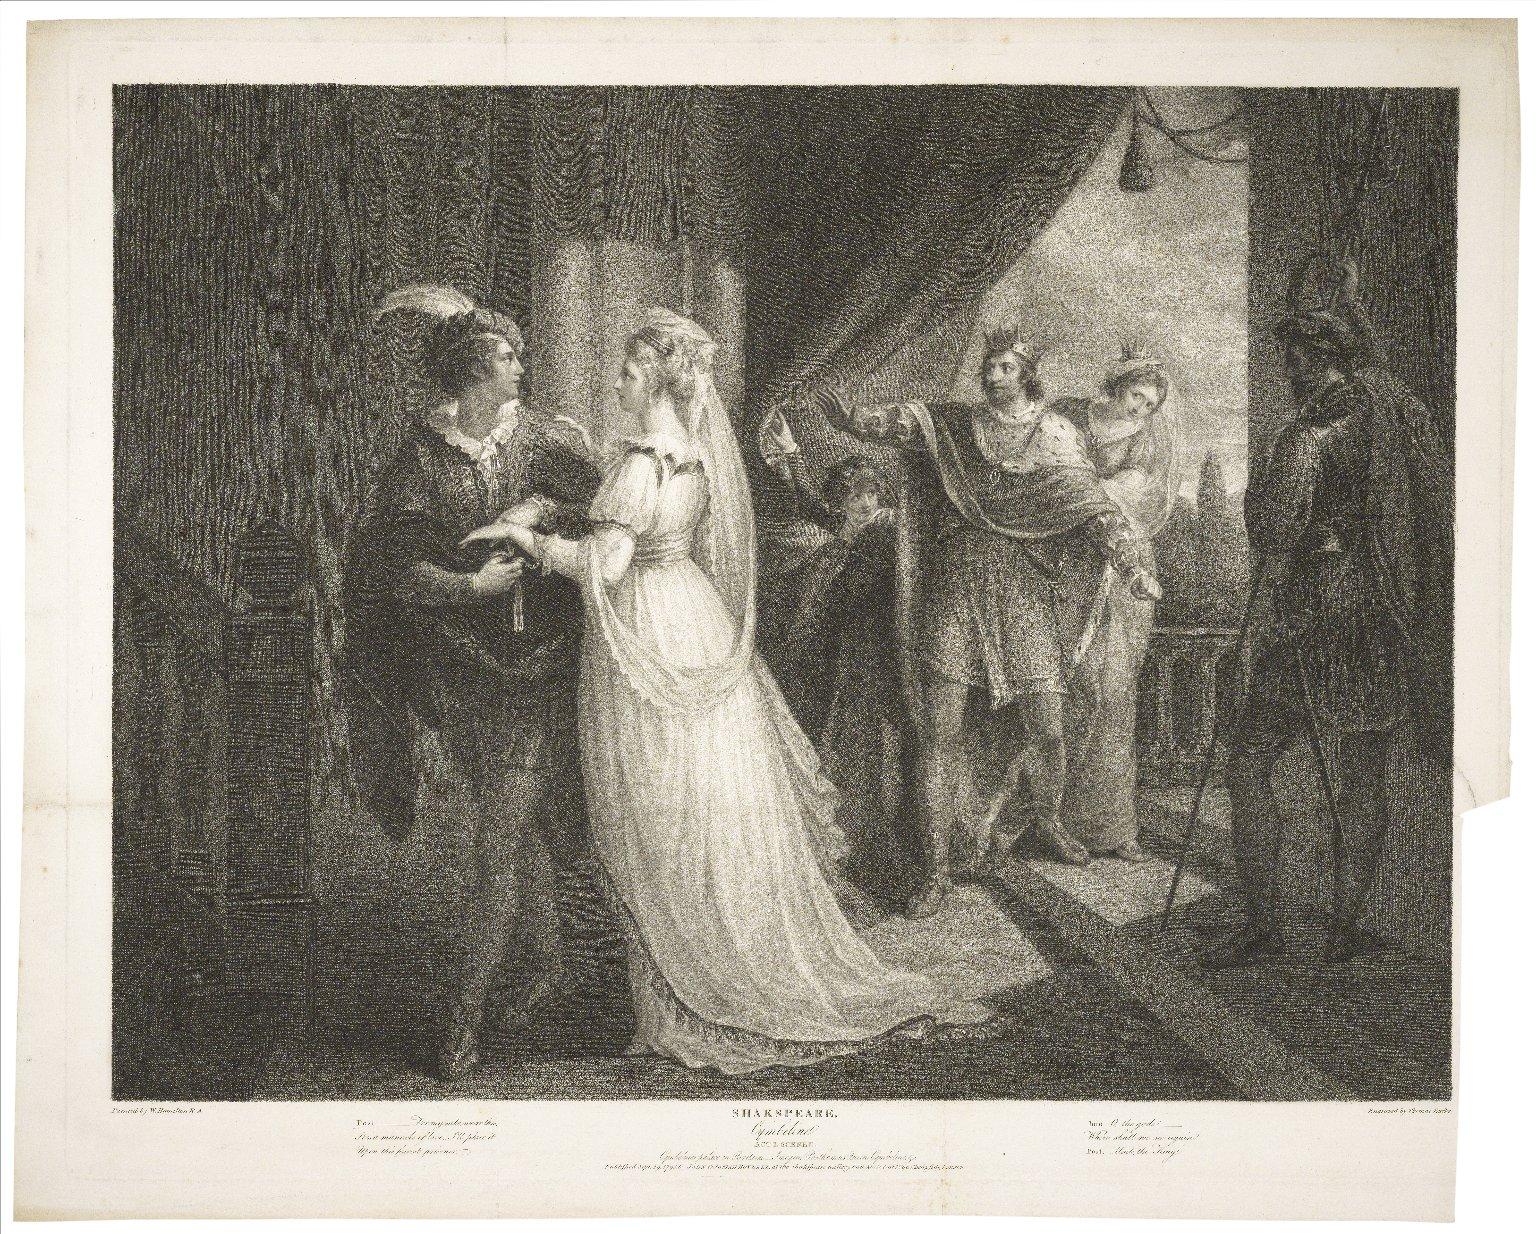 Cymbeline, act I, scene II [i.e. I], Cymbeline's palace in Britain: Imogen, Posthumus, Queen, Cymbeline &c... [graphic] / painted by W. Hamilton ; engraved by Thomas Burke.